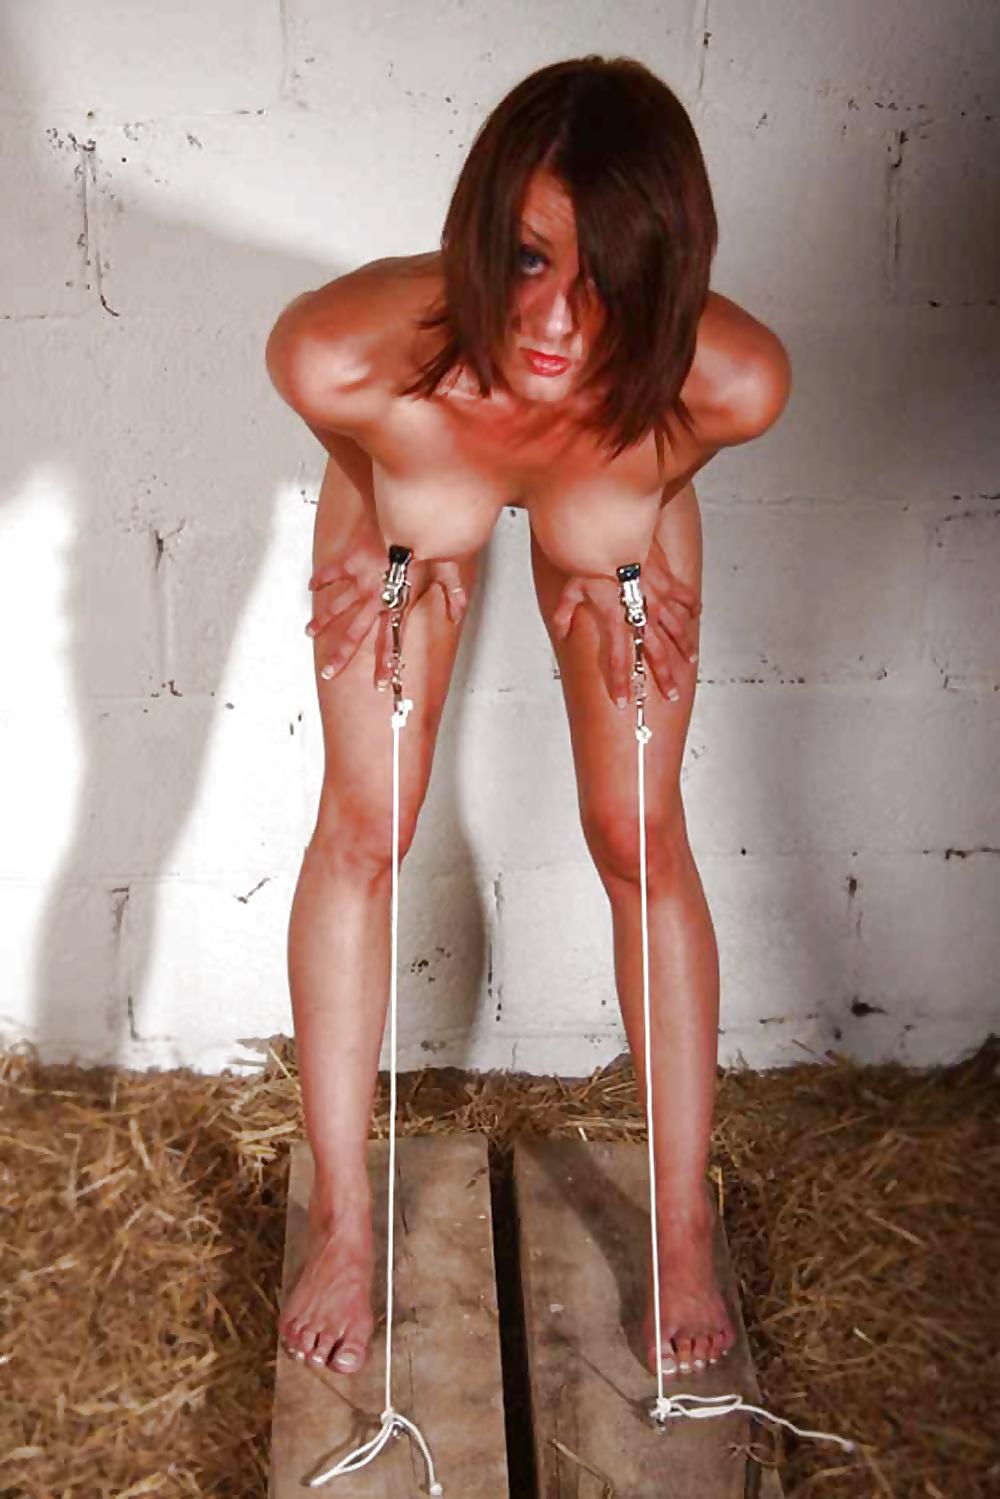 Gotoporn stretching womens nipples girls